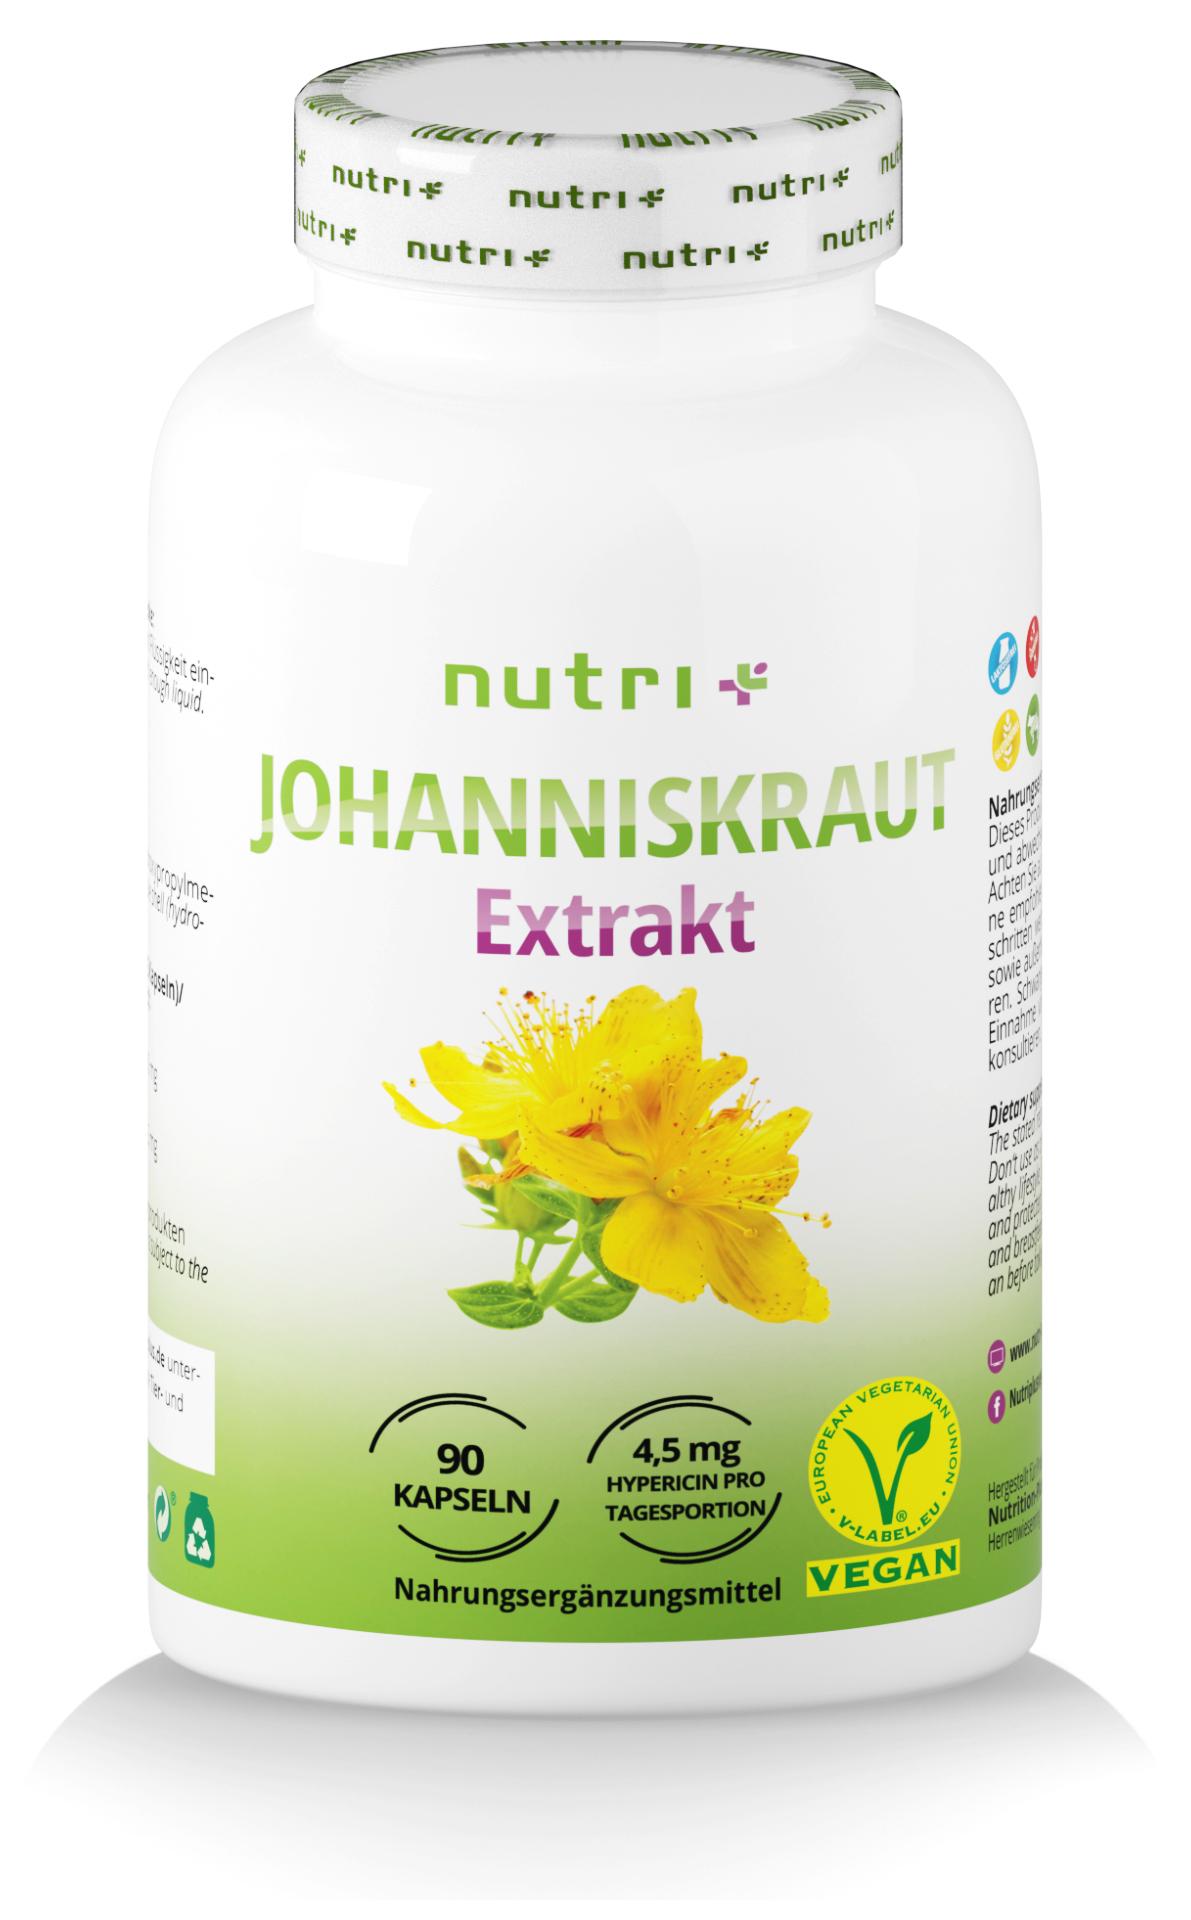 nutri+ Johanniskraut Extrakt Kapseln